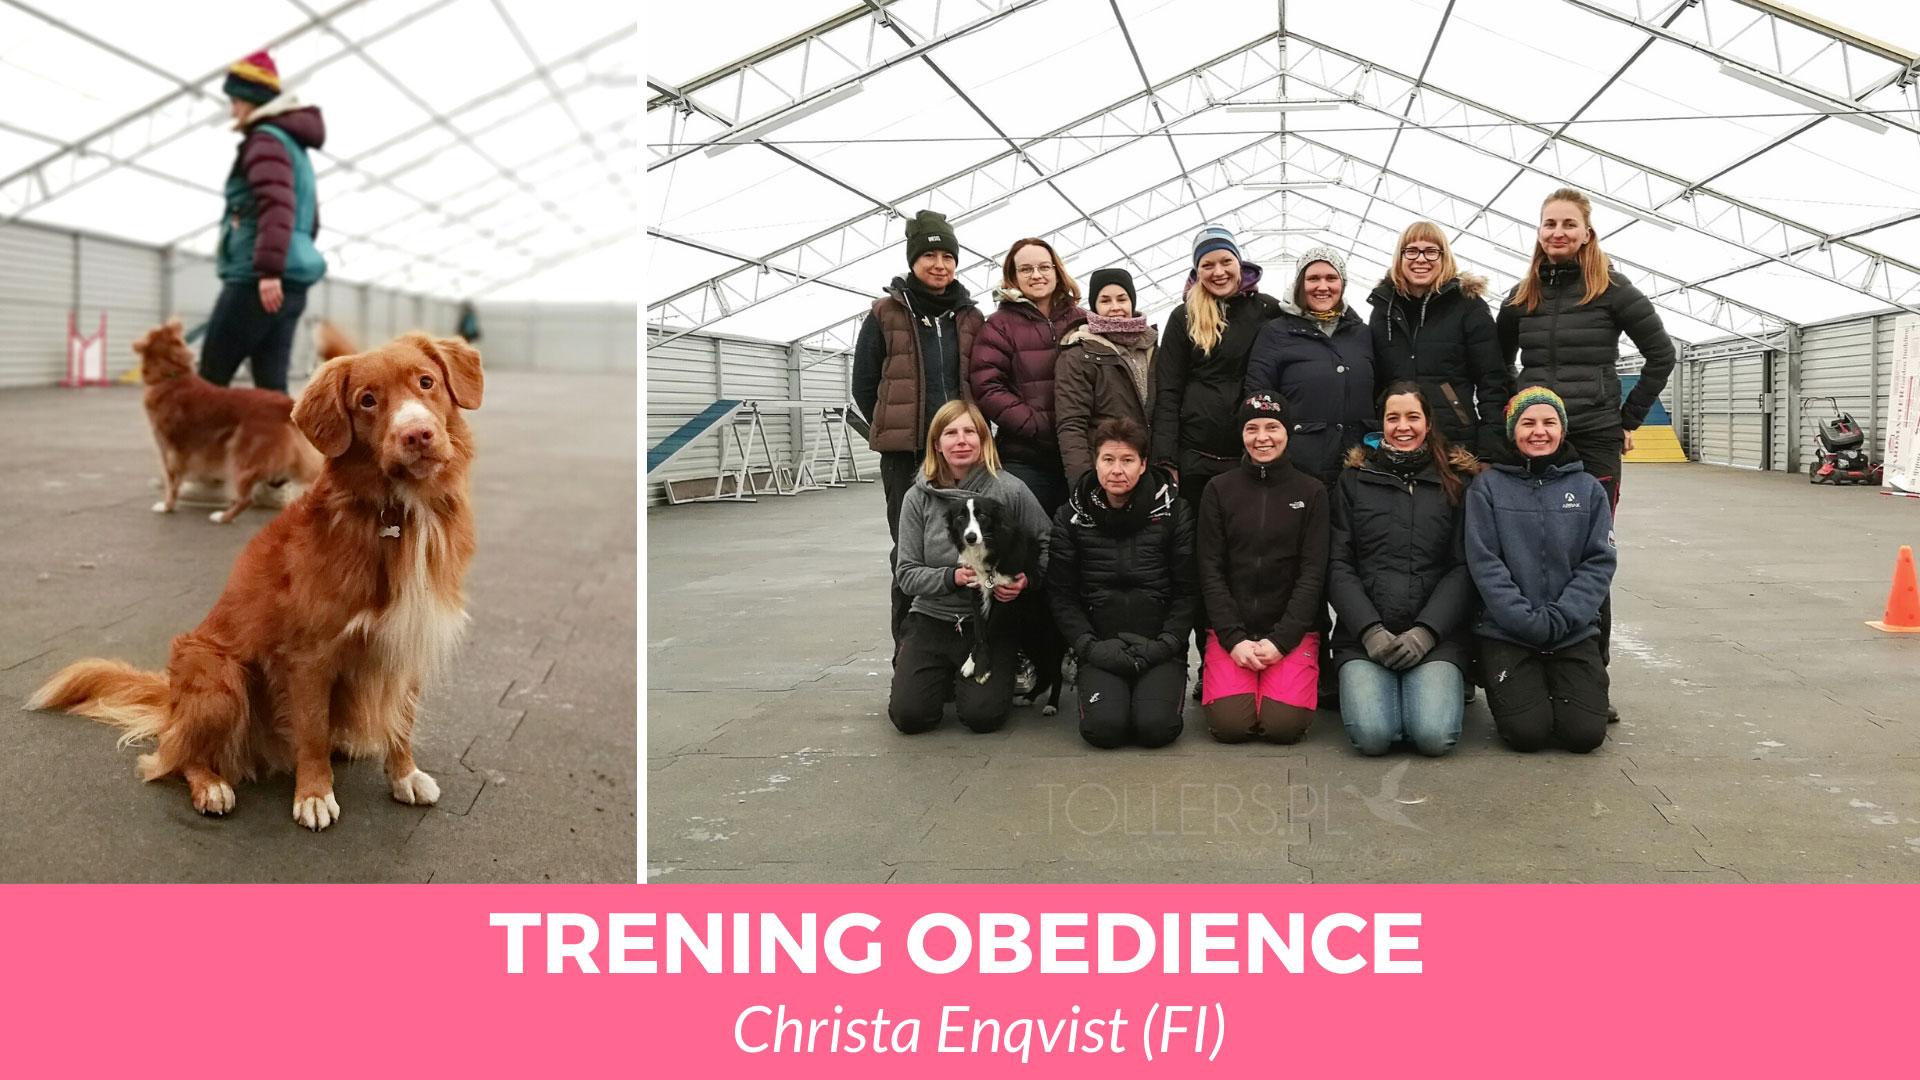 Trening obedience z Christa Enqvist.